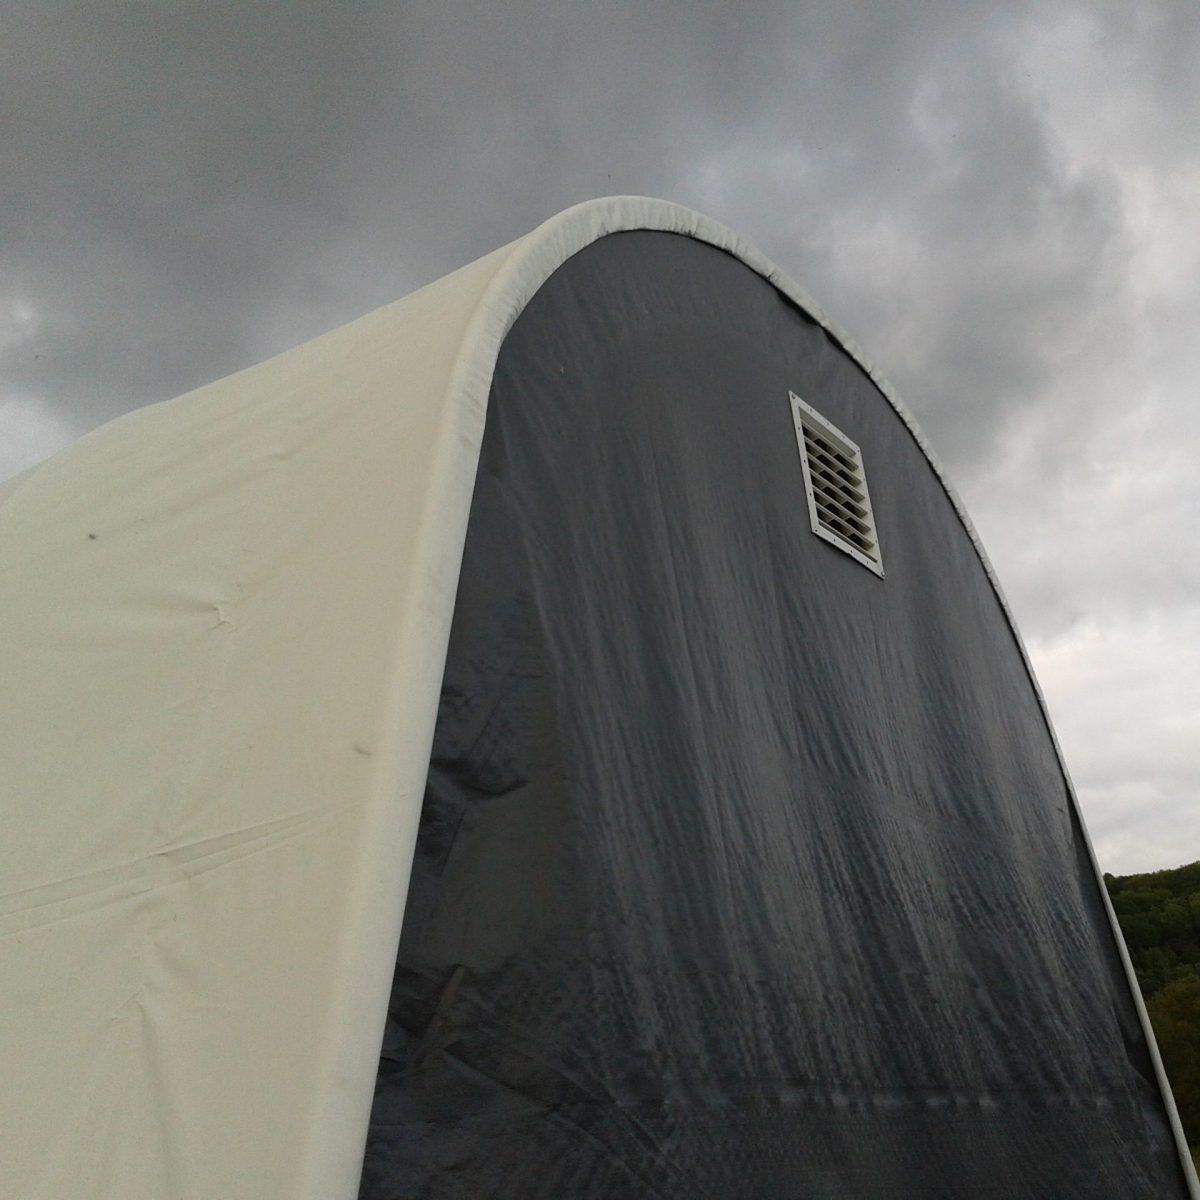 Vinyl Tarp Hoop House Shelter Round Cover Greenhouse